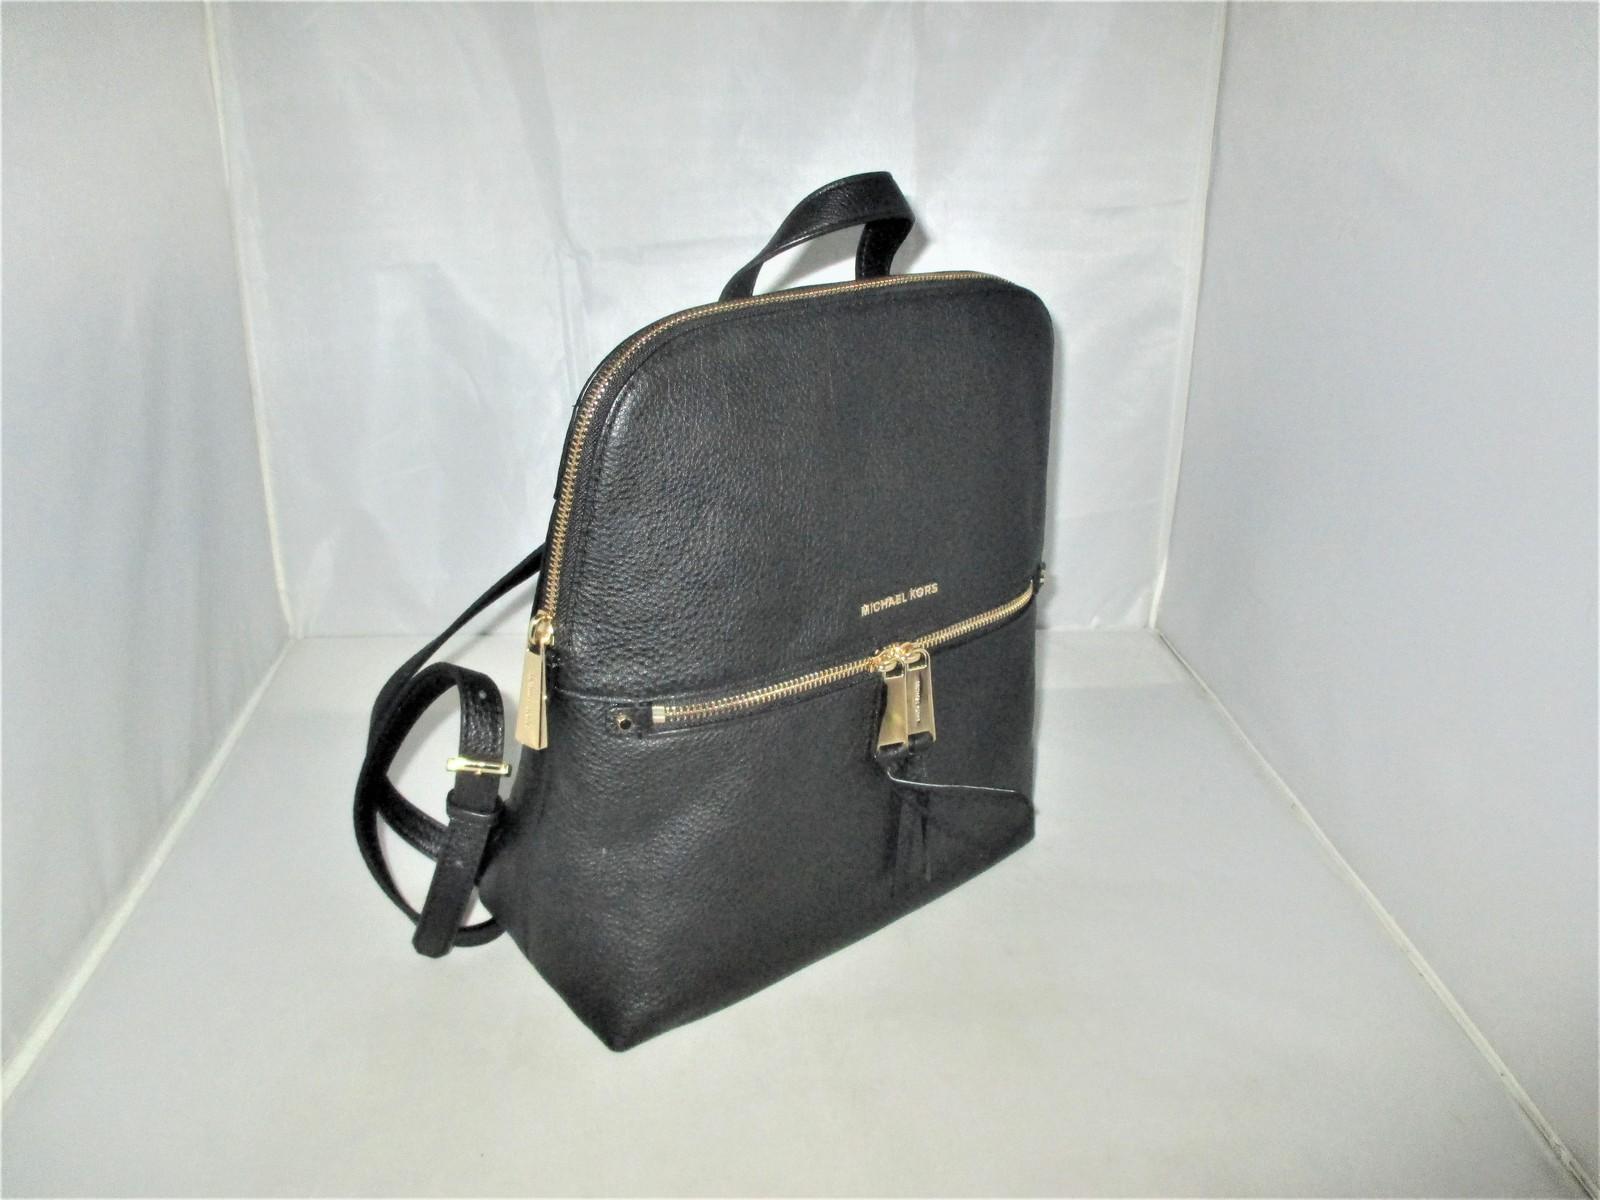 df5cae32bbeb Michael Kors Rhea Medium Slim Pebble Leather Backpack, Book Bag $258 Black